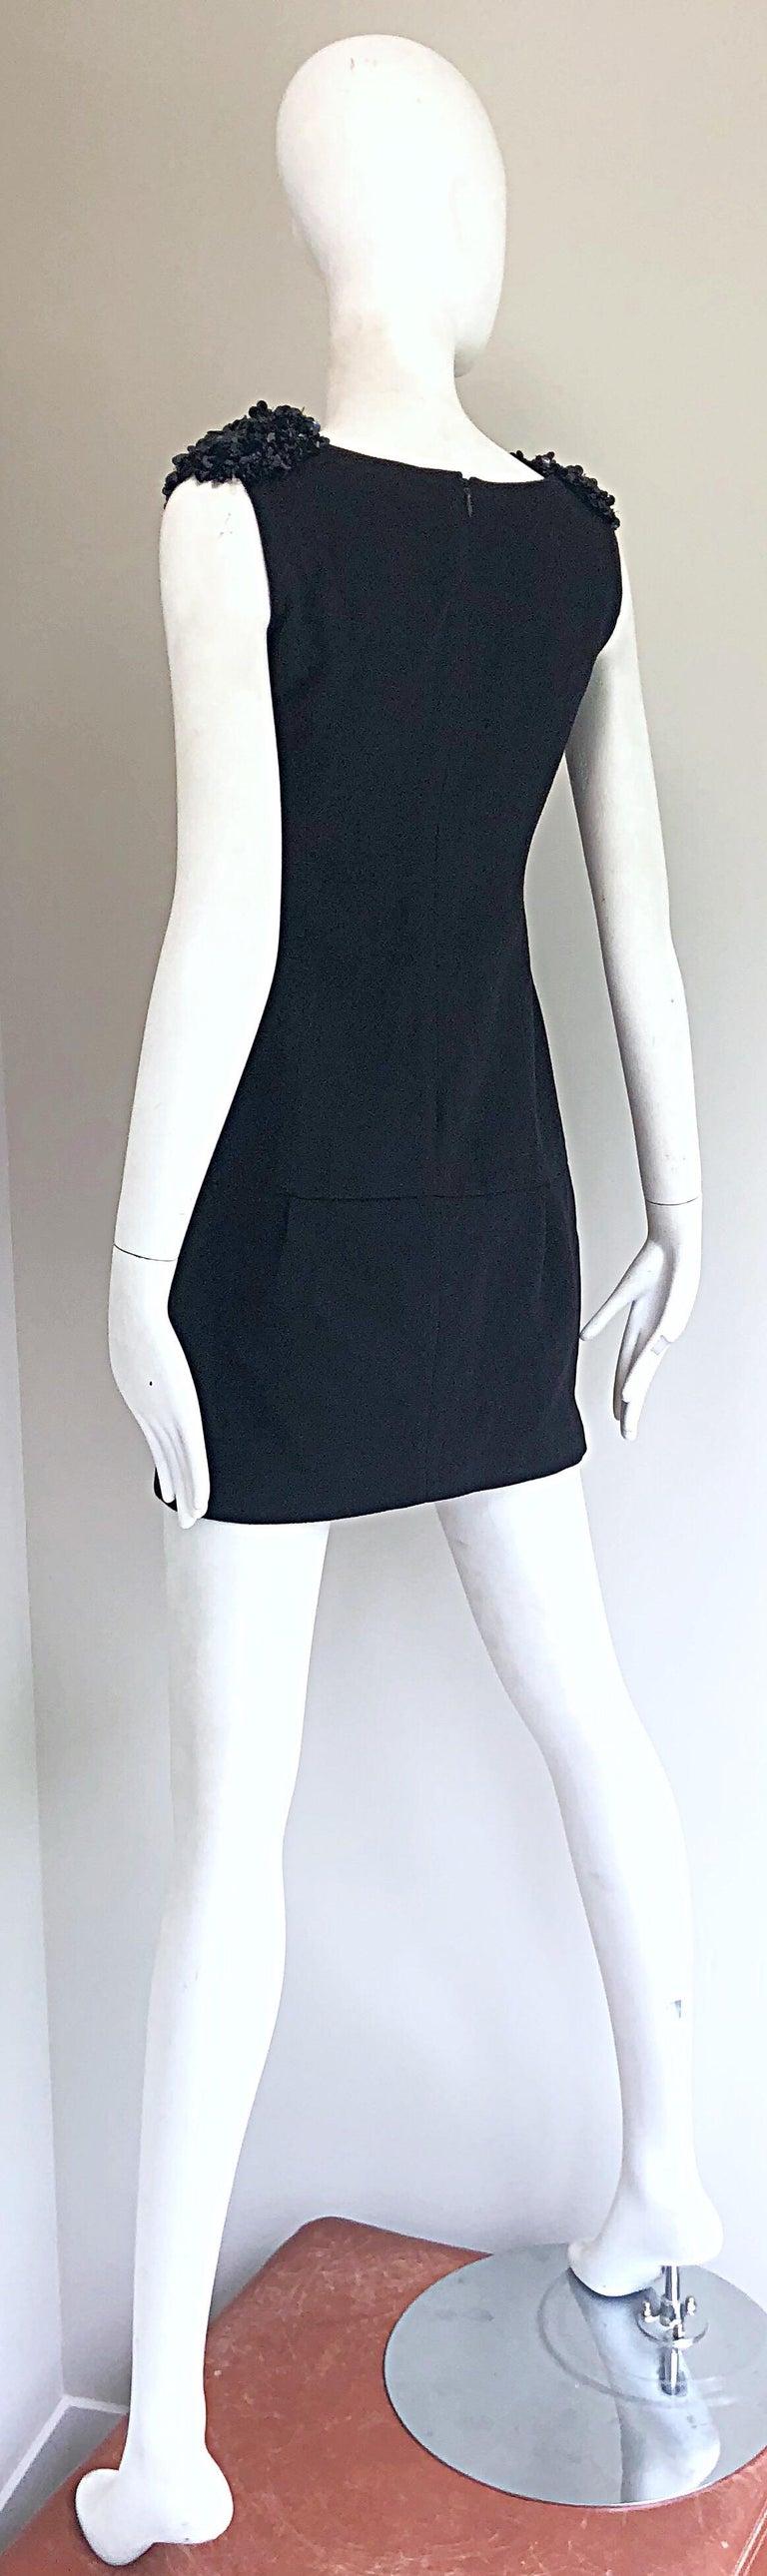 1990s Miu Miu Black Virgin Wool Sequin Beaded Vintage 90s Mini Dress For Sale 9